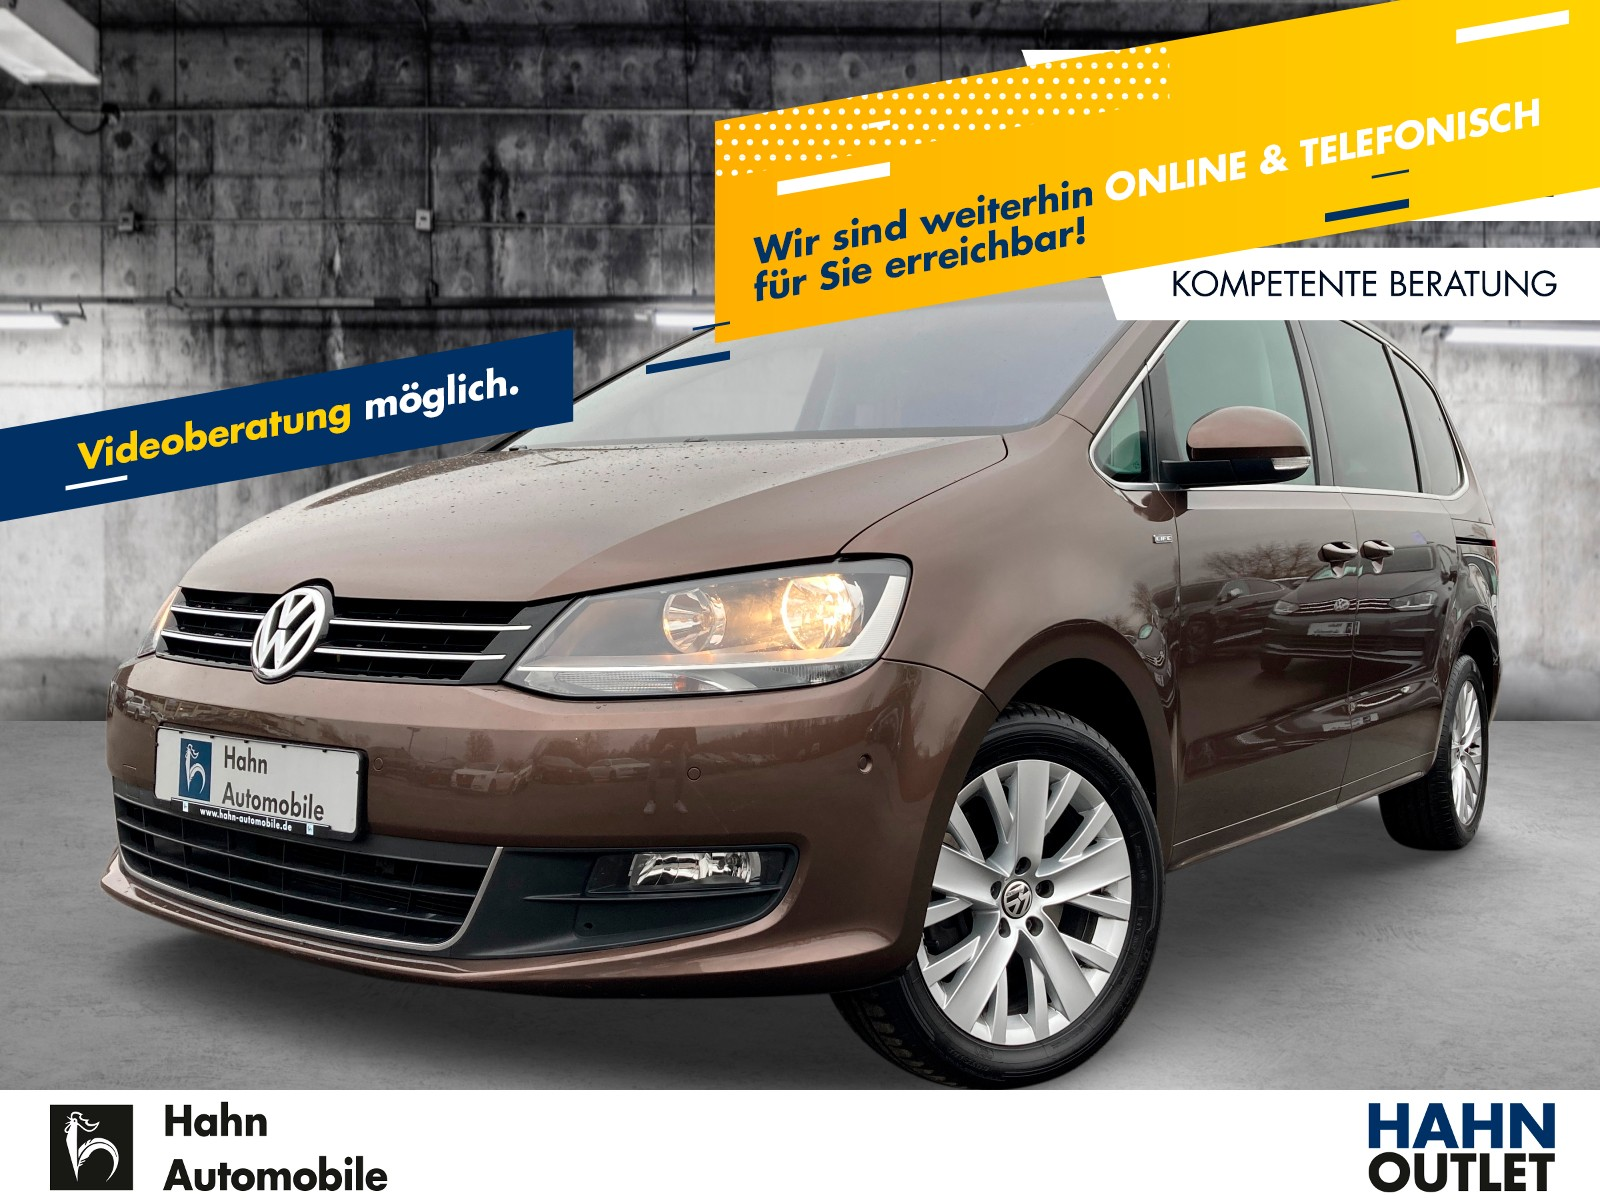 Volkswagen Sharan 2.0 TDI LIFE Navi AHK 7-Sitzer PDC LM, Jahr 2013, Diesel